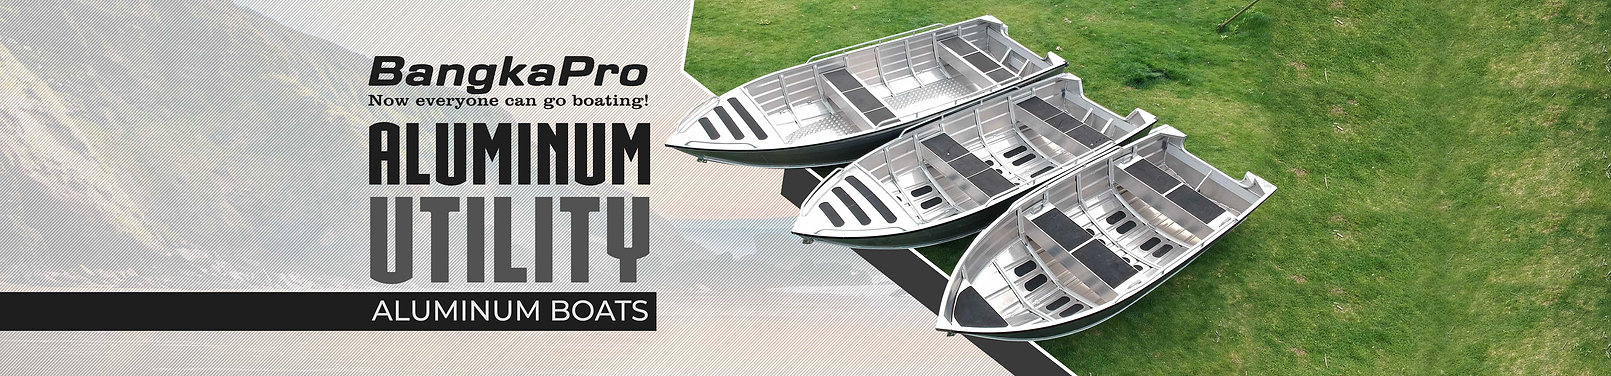 Utility boat.jpg